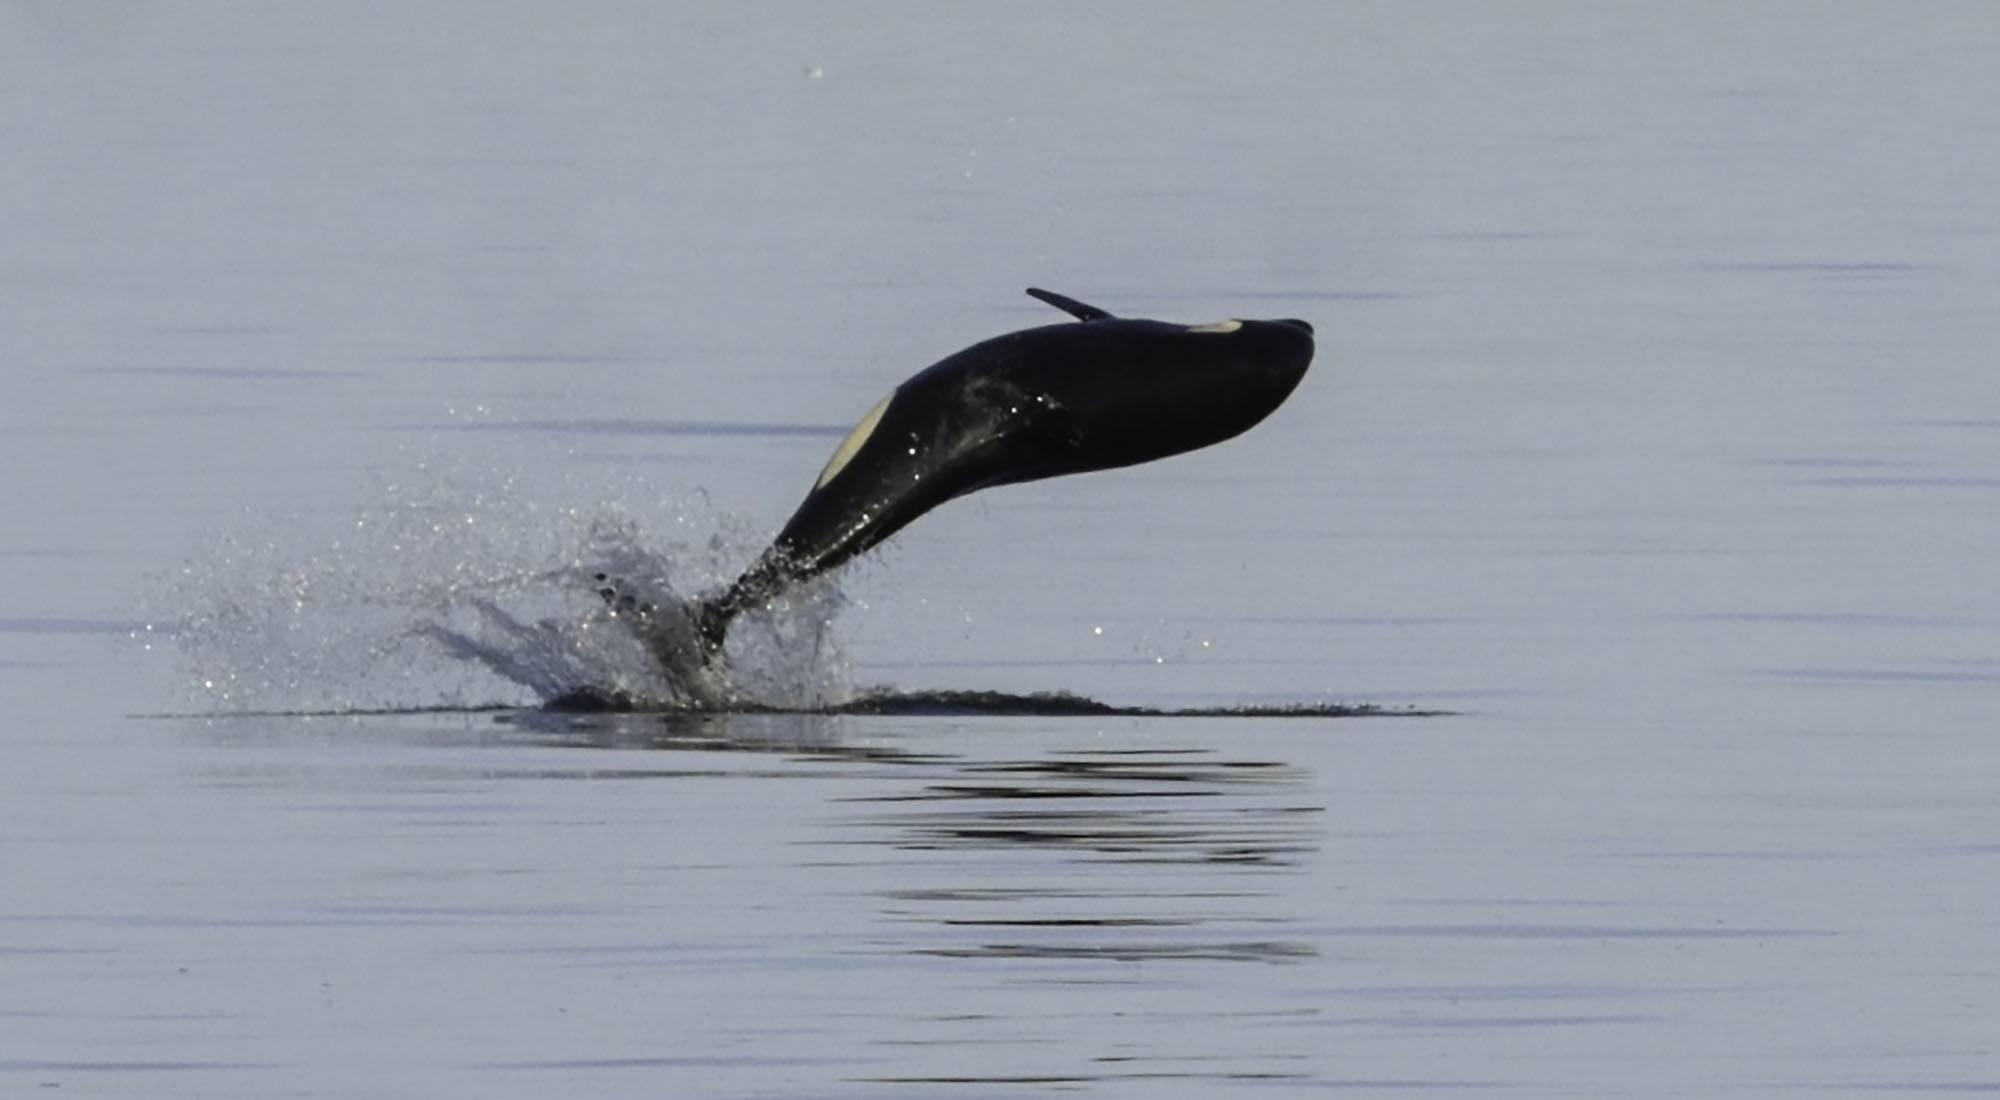 Orca calf Sonic (J52). Photo by Naturalist/Capt Heather MacIntyre, Maya's Legacy Whale Watching, Friday Harbor, WA.